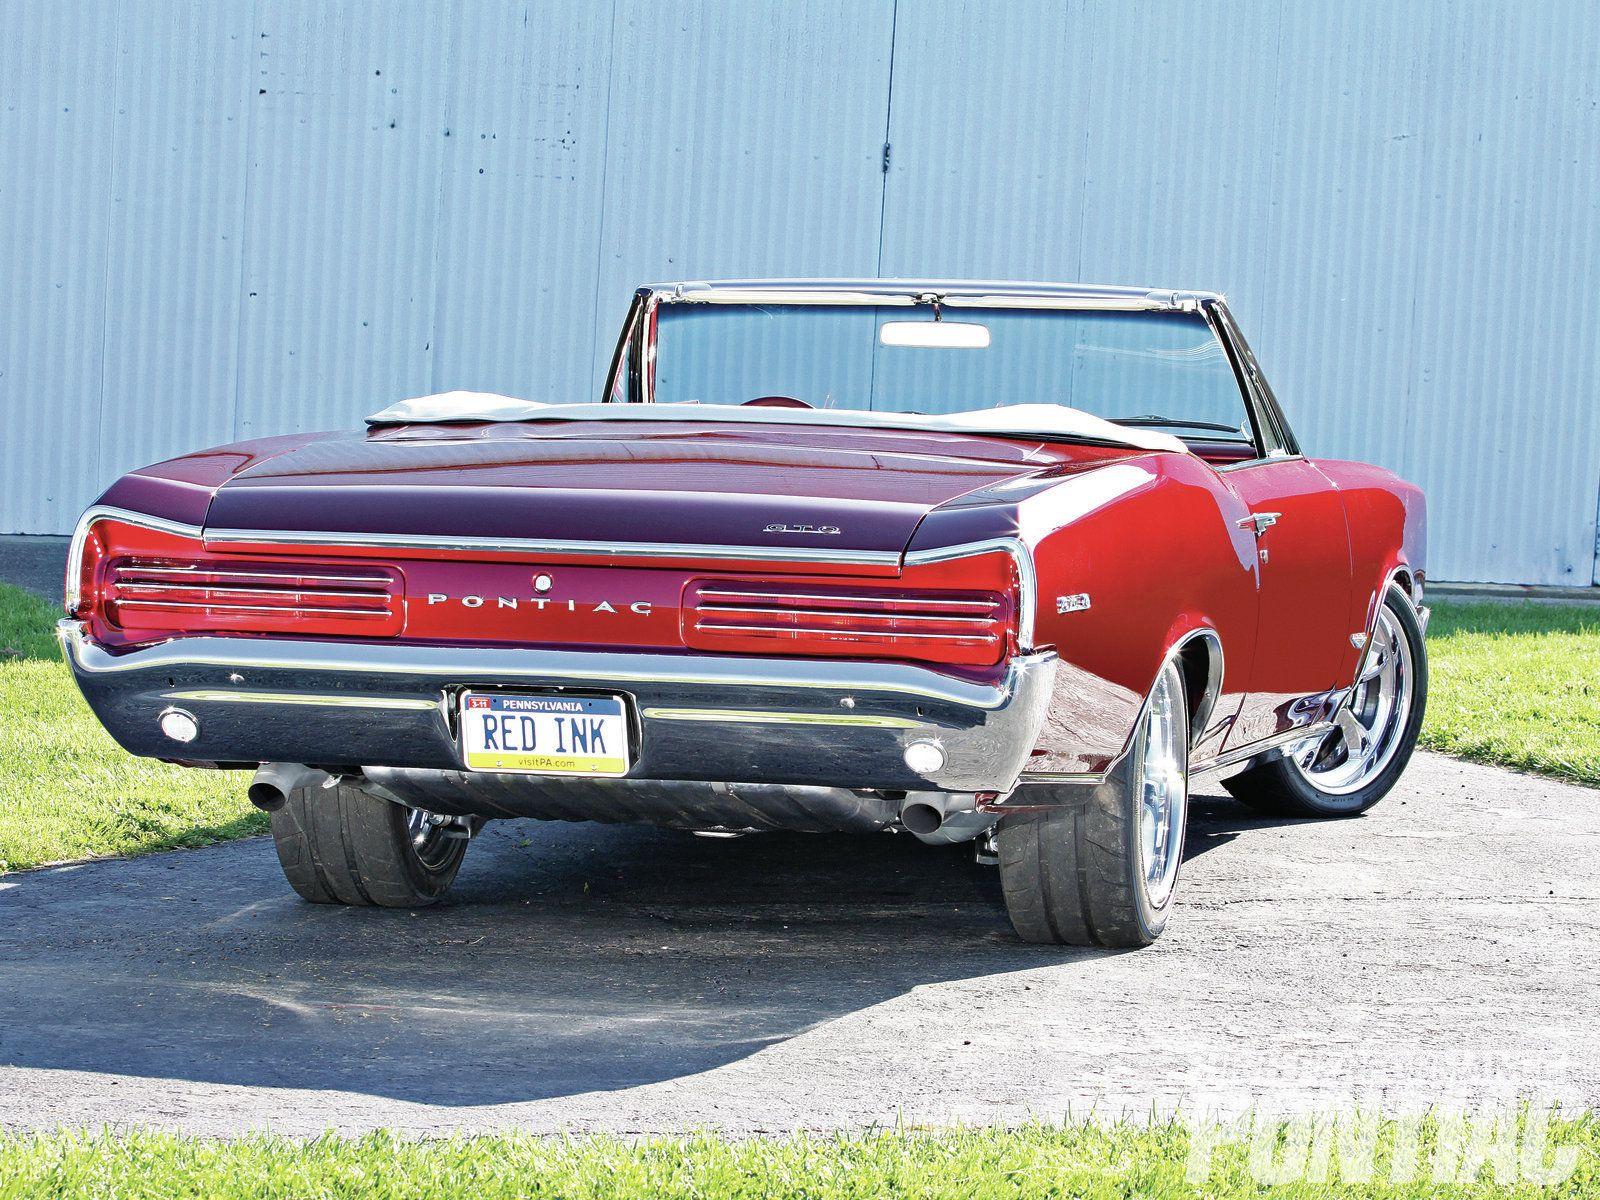 1966 Pontiac Gto Rear Photo 3 Pontiac Gto Pontiac Cars Muscle Cars